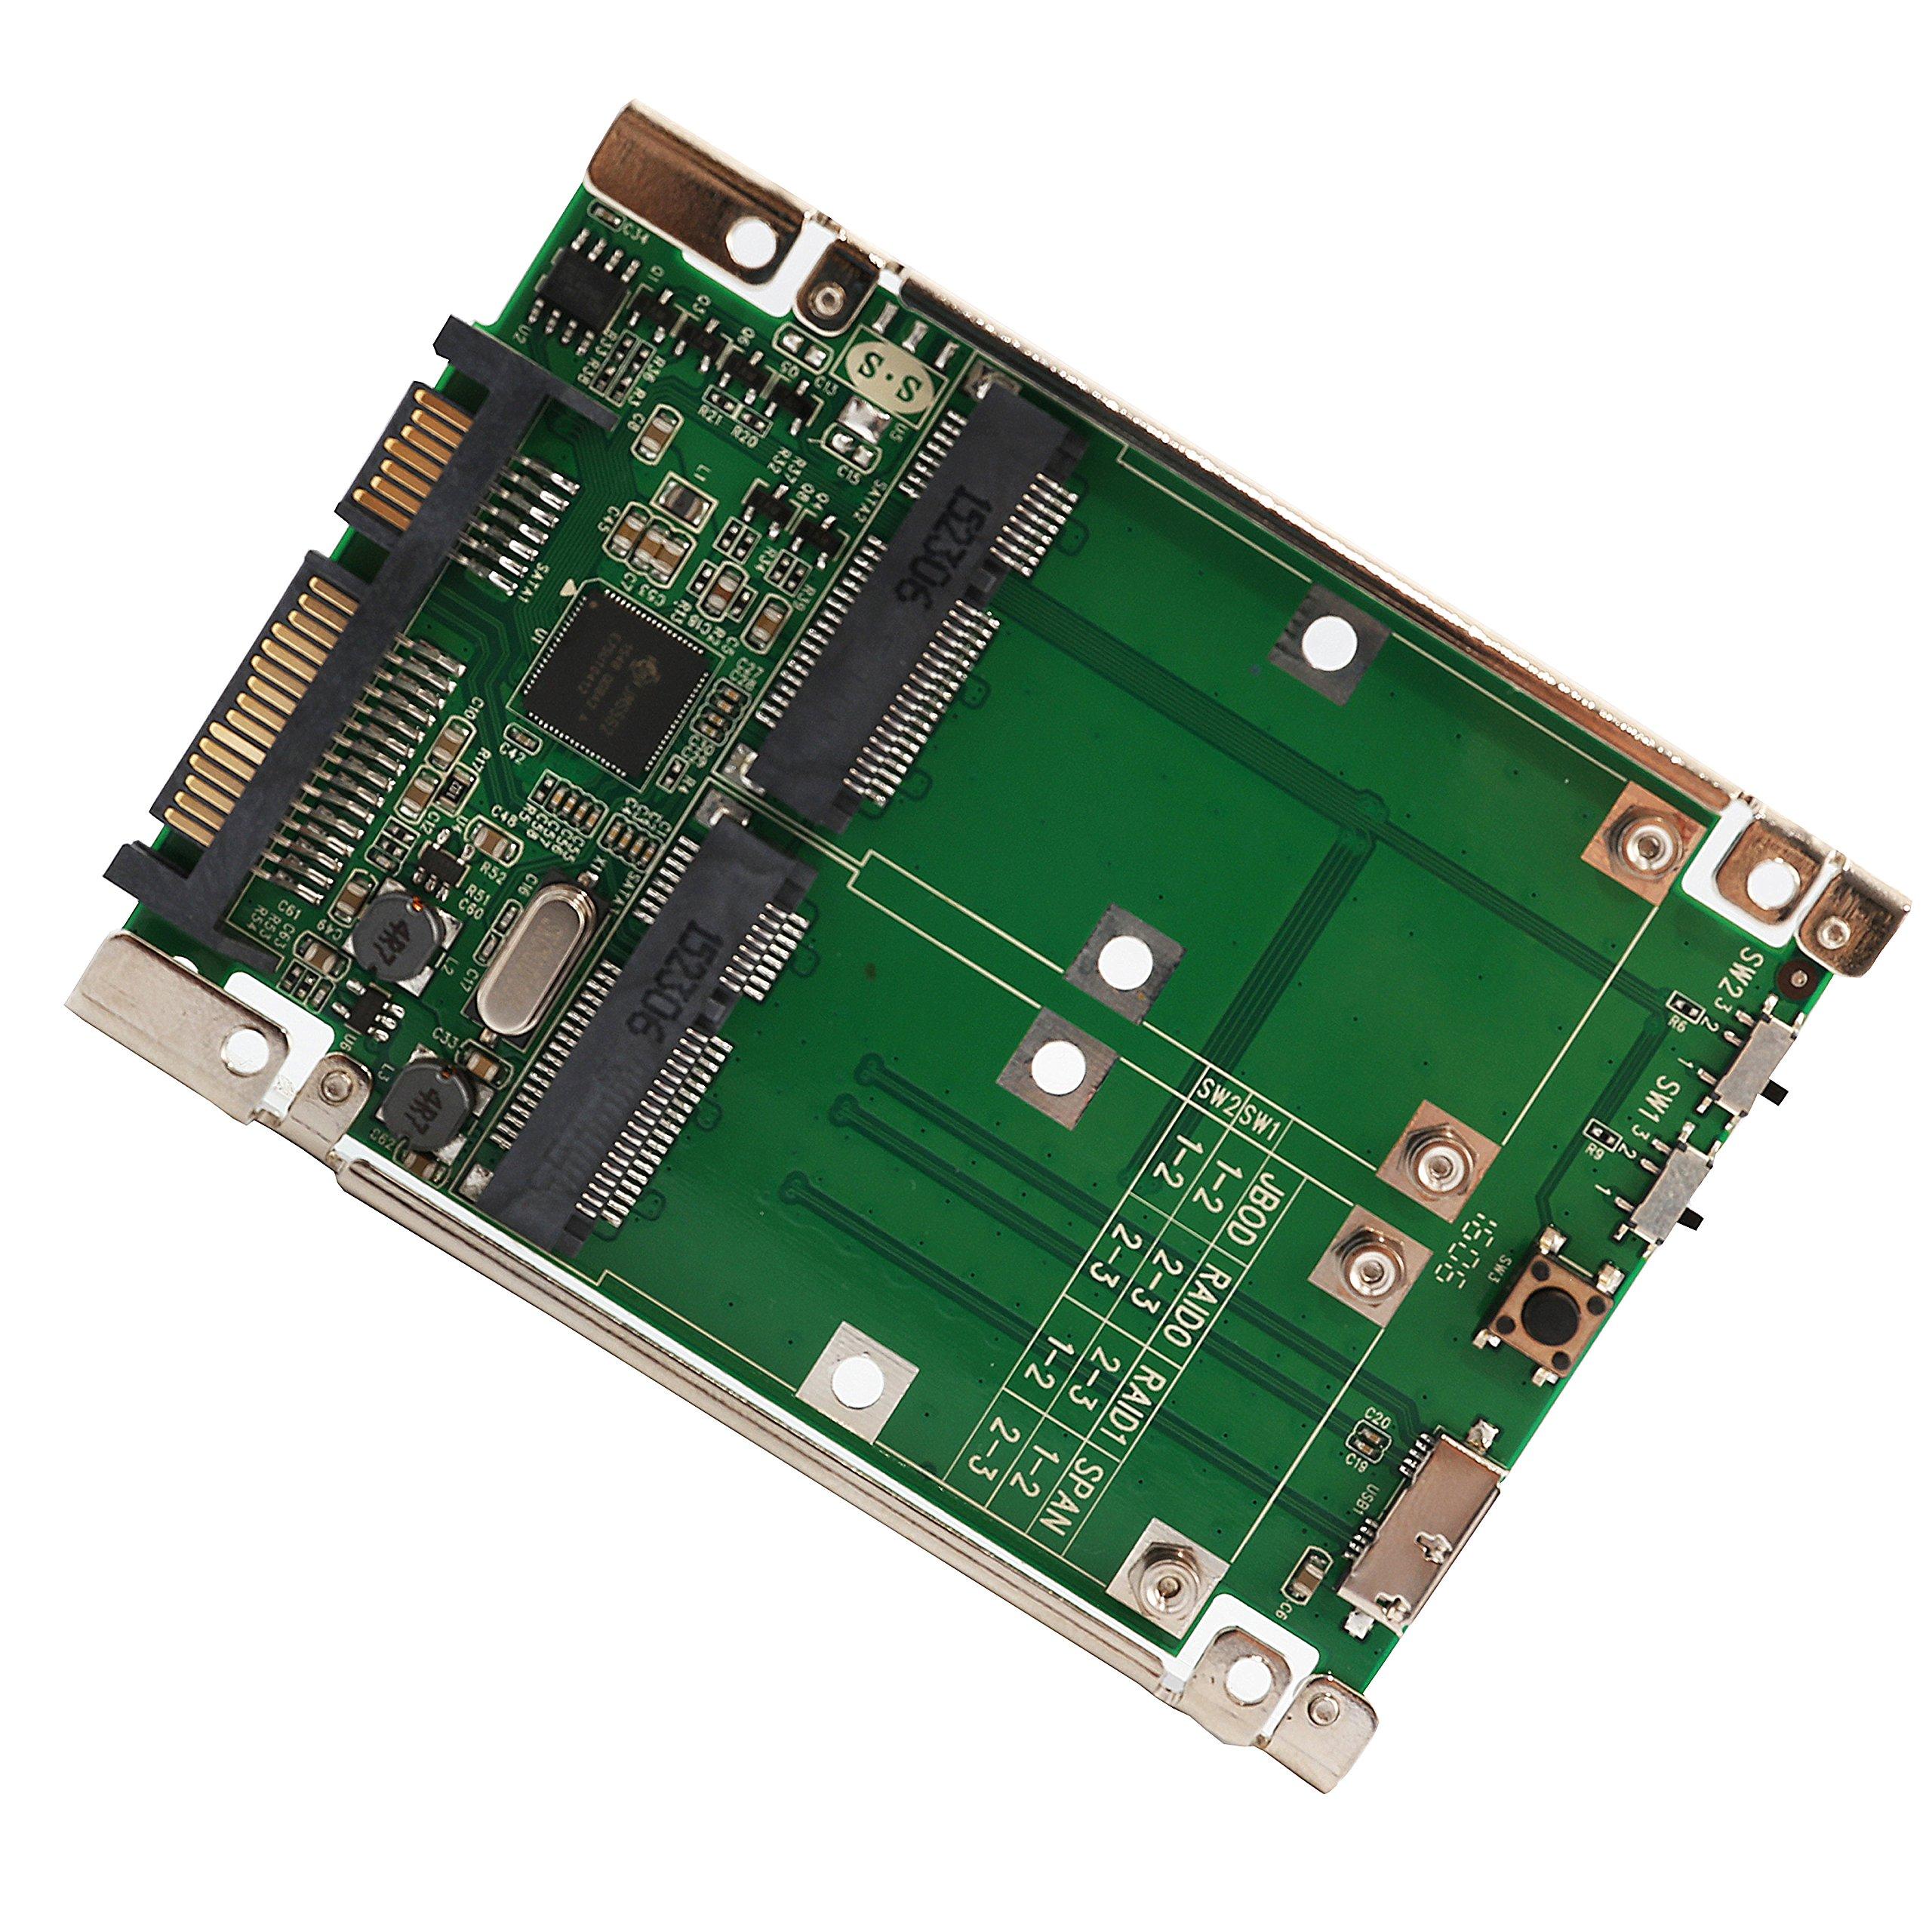 Syba Dual mSATA SSD to SATA III RAID 2.5-Inch Enclosure SY-ADA40090